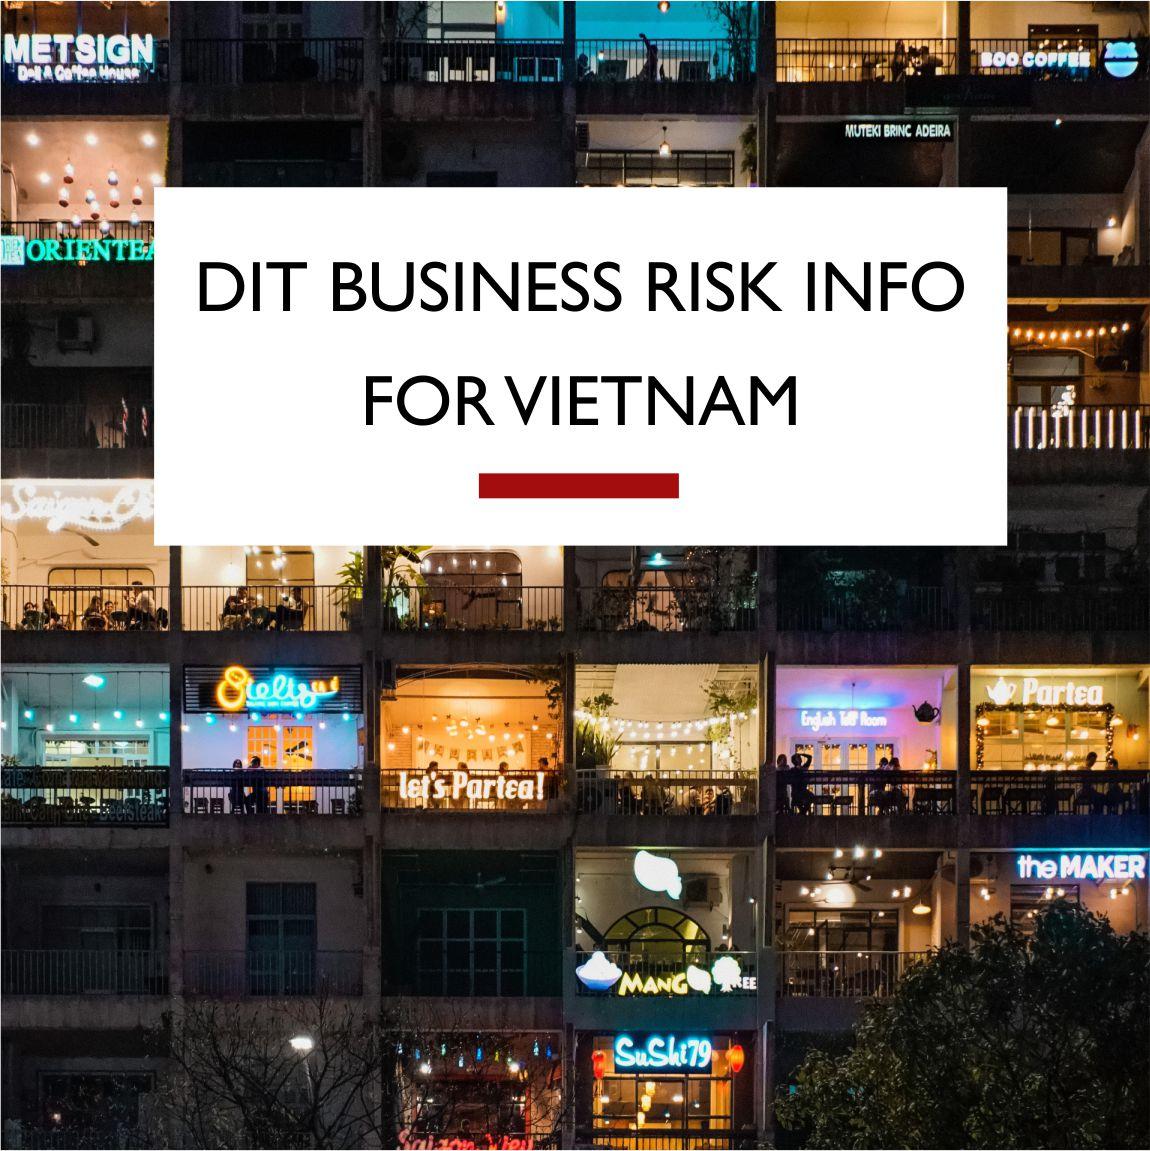 article-header-vietnam.jpg